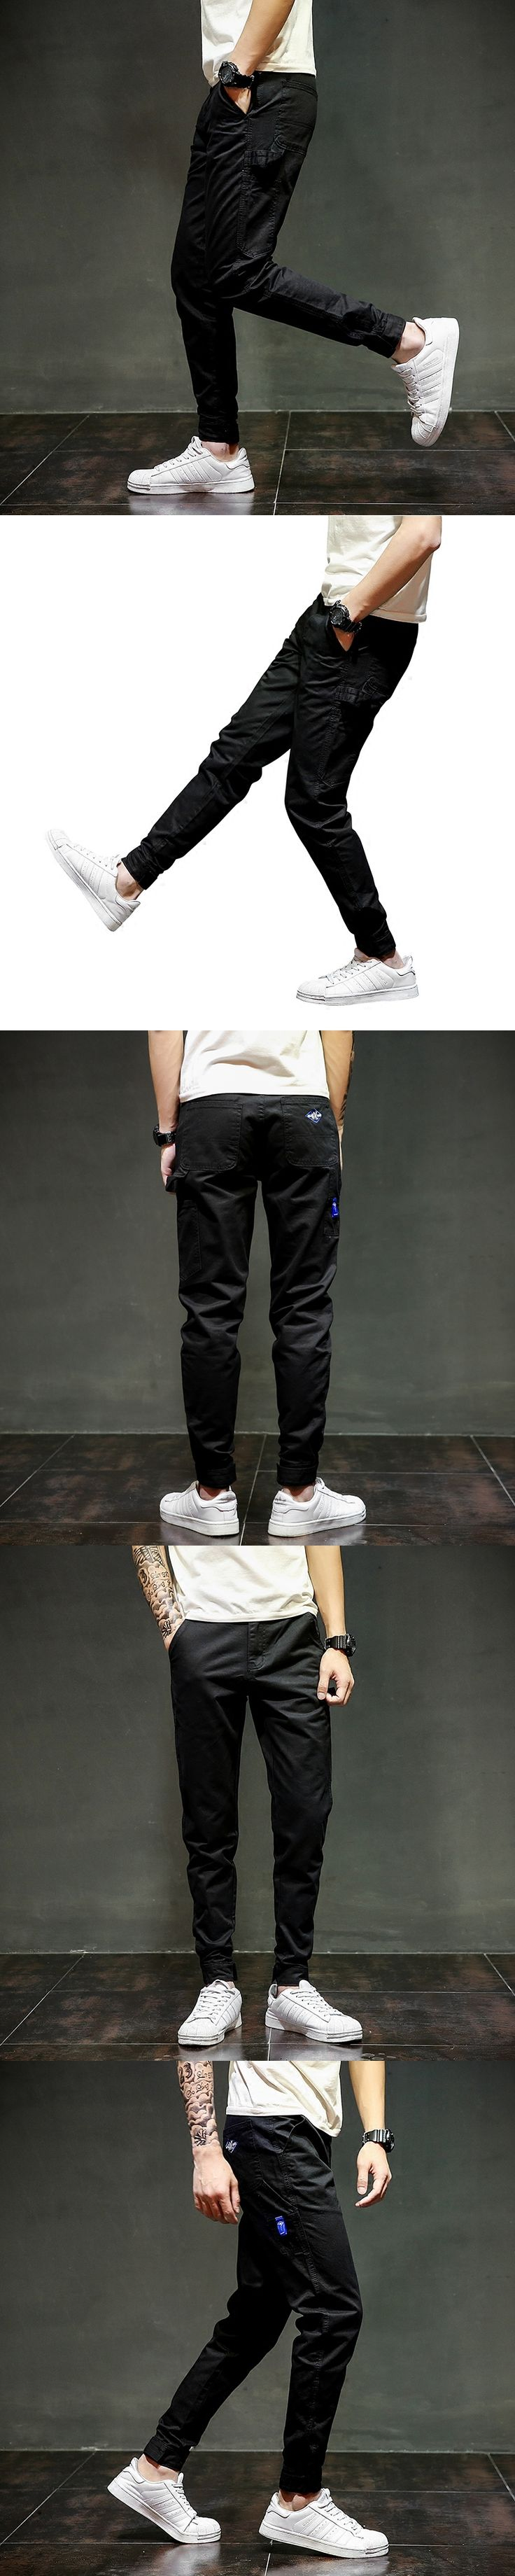 Designer Black Jeans Ankle Length Casual Pants High Quality Harem Pants 28-40 Brand Clothing Men`s Jogger Jeans Pants C315